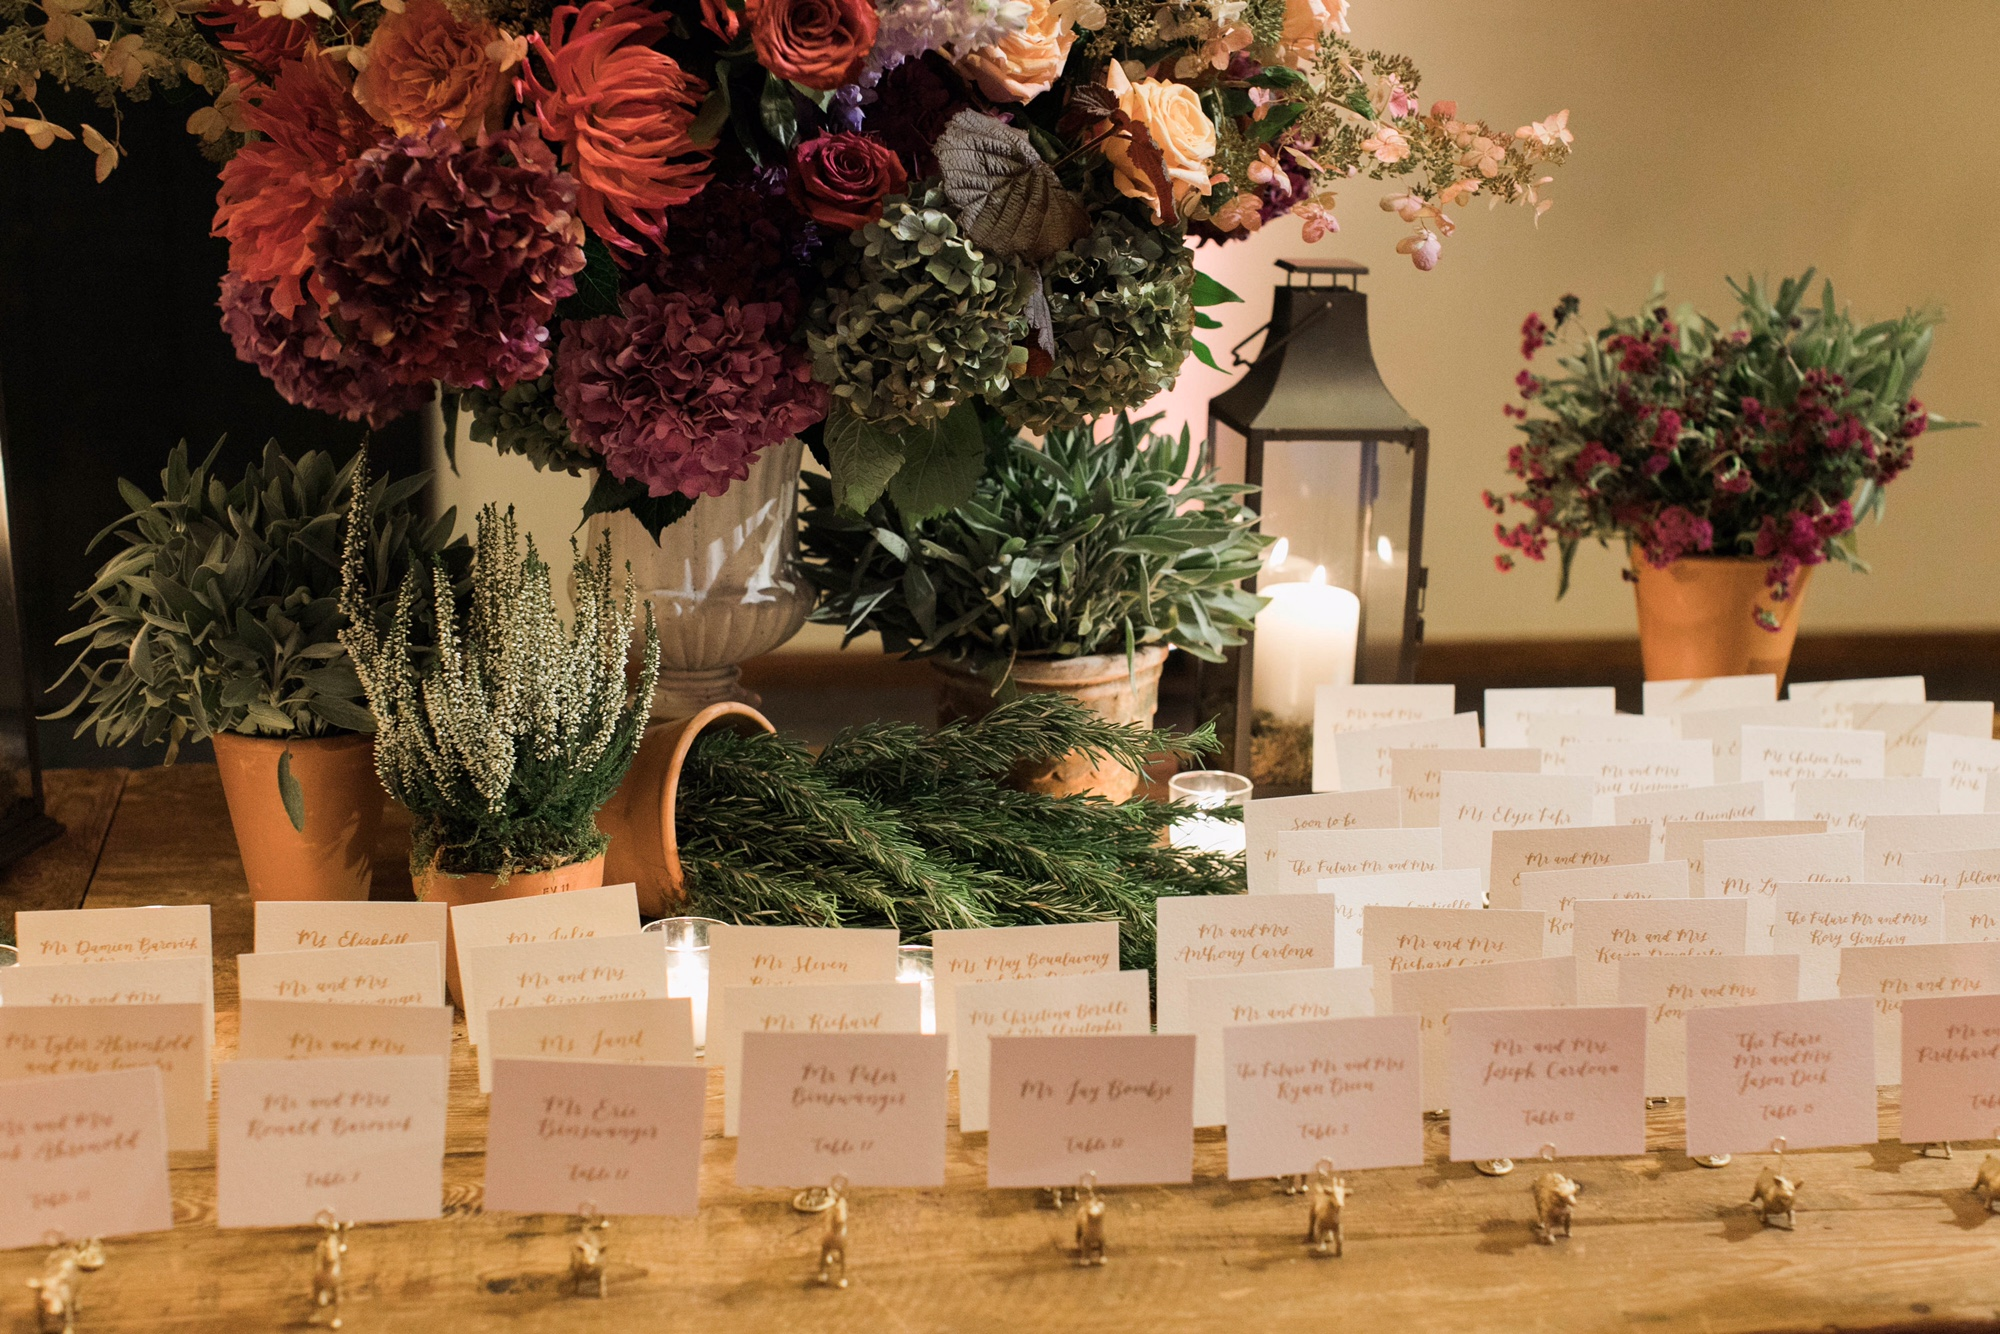 Elegant Affair Wedding at the Farm - Flowers by Denise Fasanello Flowers - Photos by Meg Miller 9.JPG